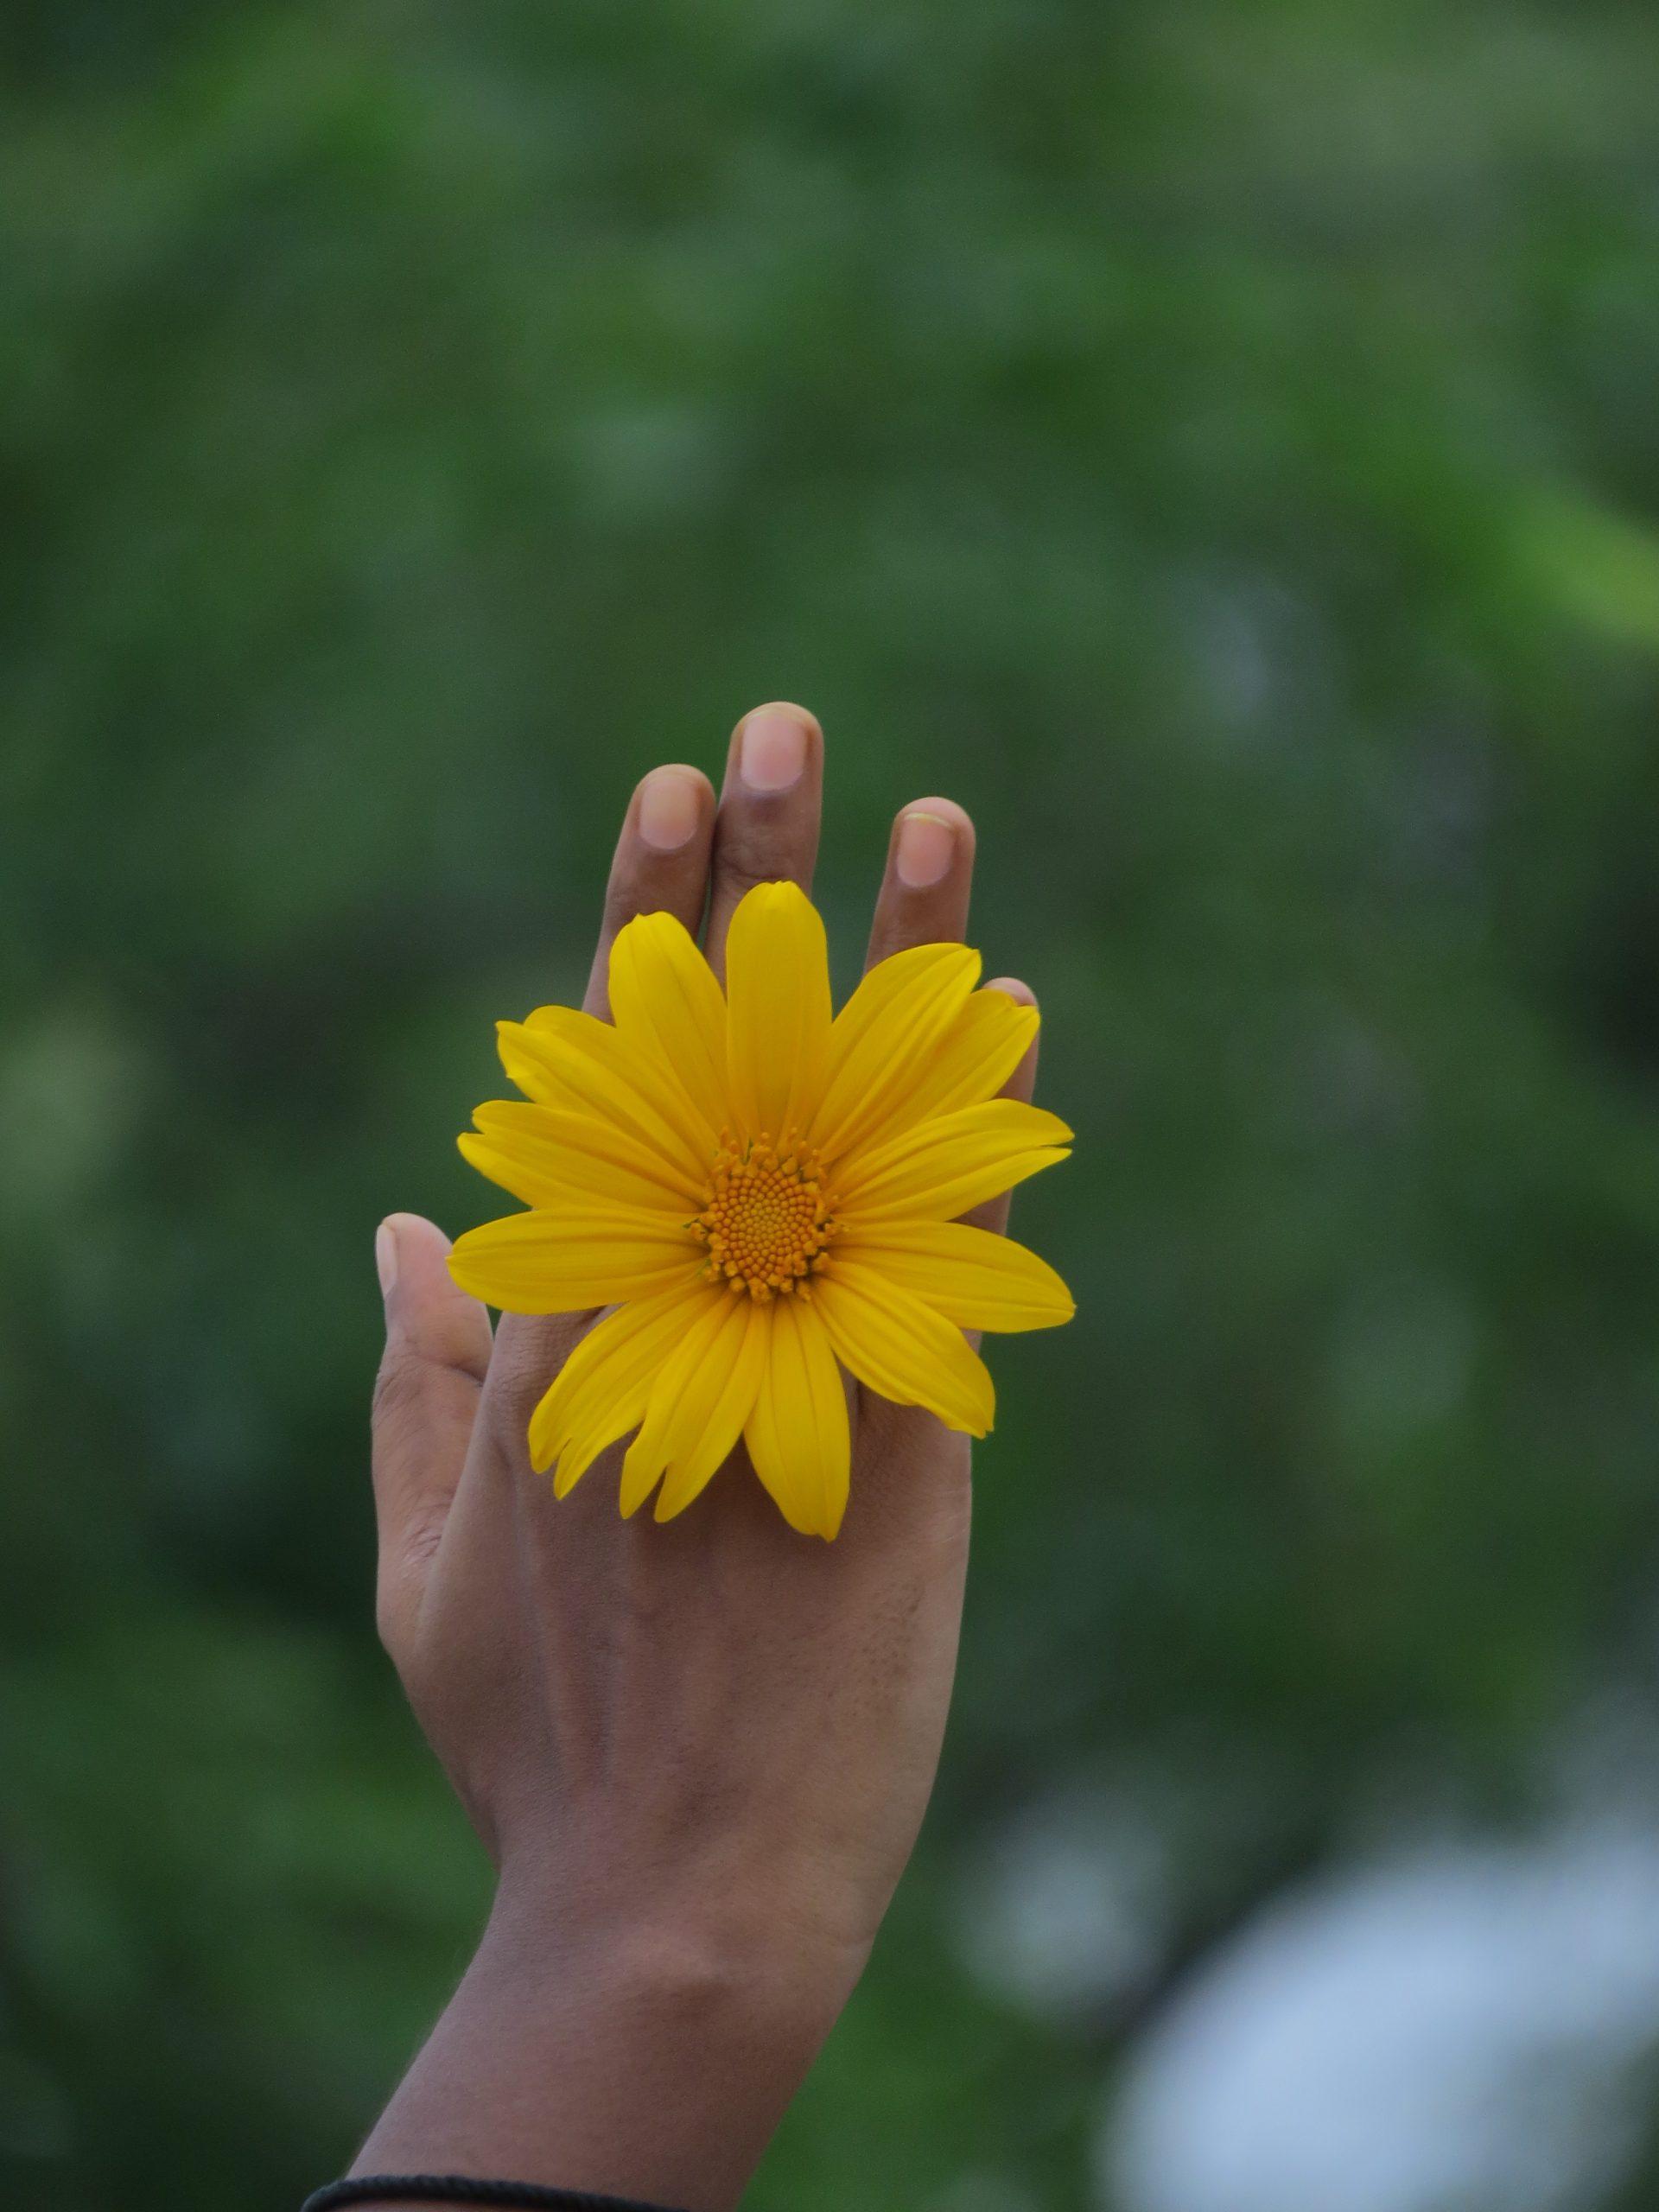 Yellow flower in hand